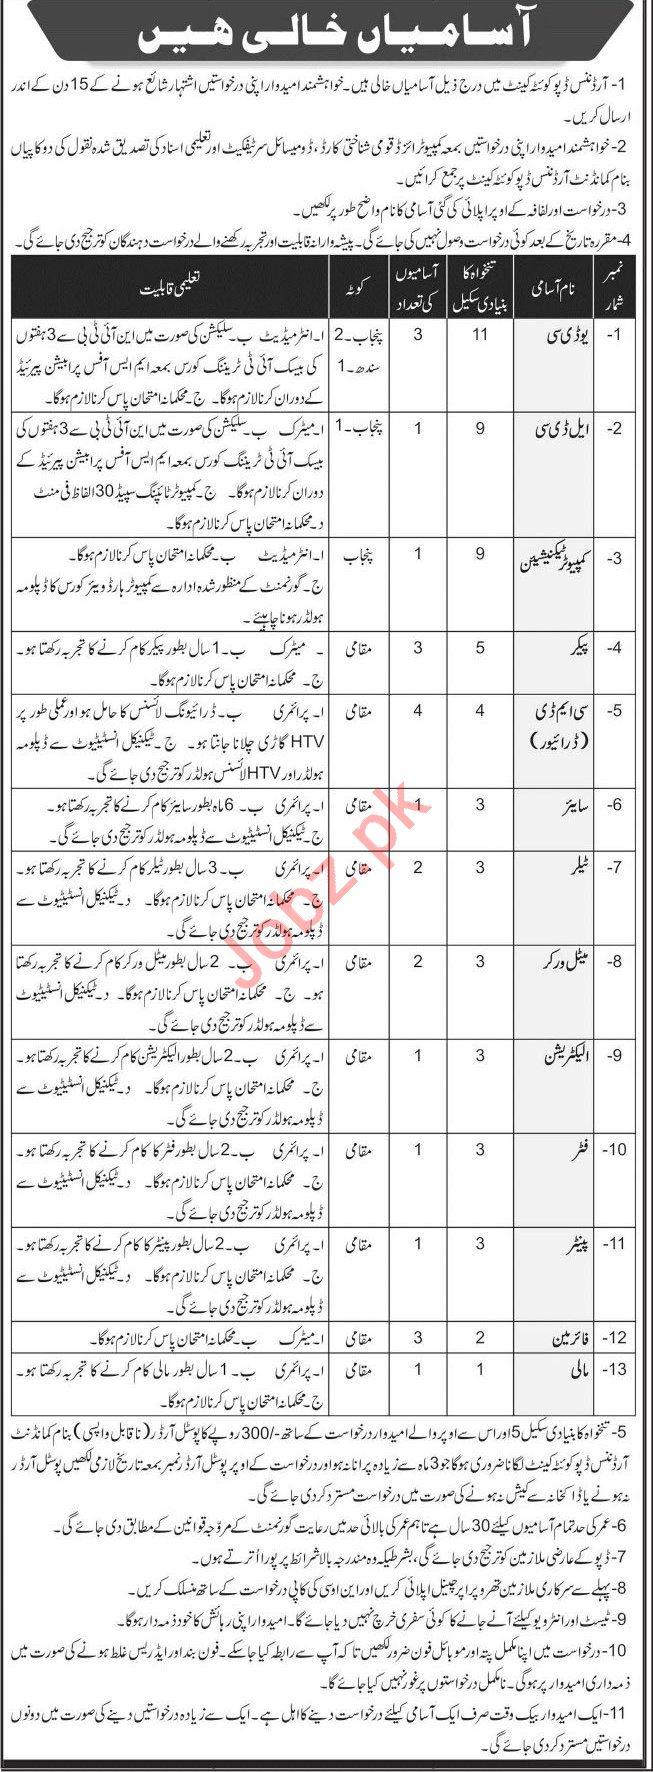 Pak Army Ordnance Depot Quetta Cantt Jobs 2020